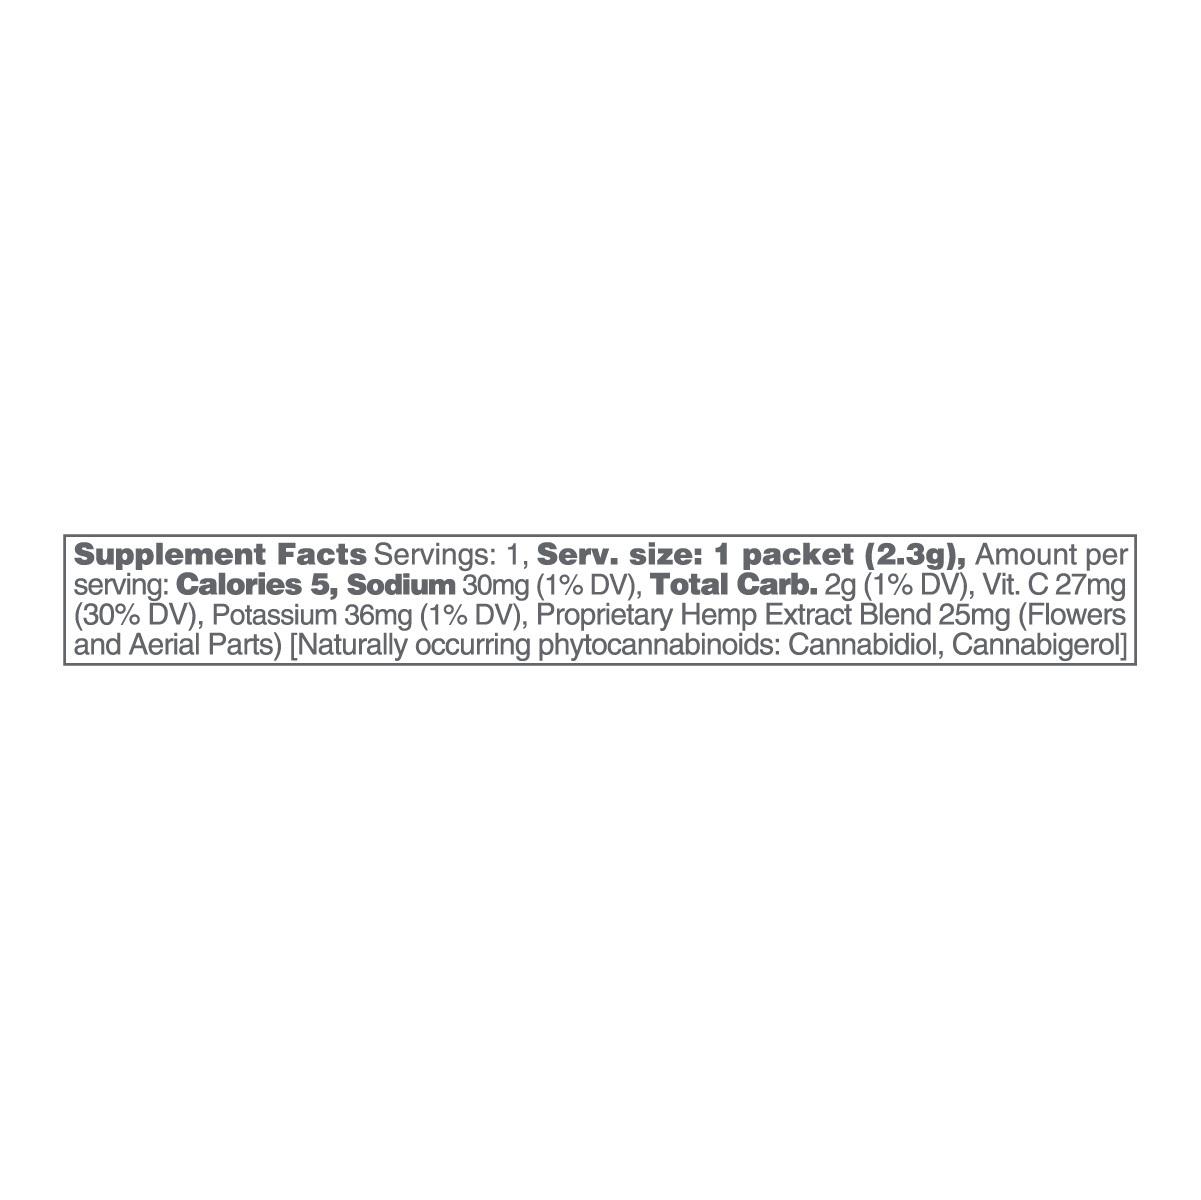 cbdMD, CBD Powdered Drink Mix, Broad Spectrum THC-Free, Peach, 10ct, 250mg CBD 2